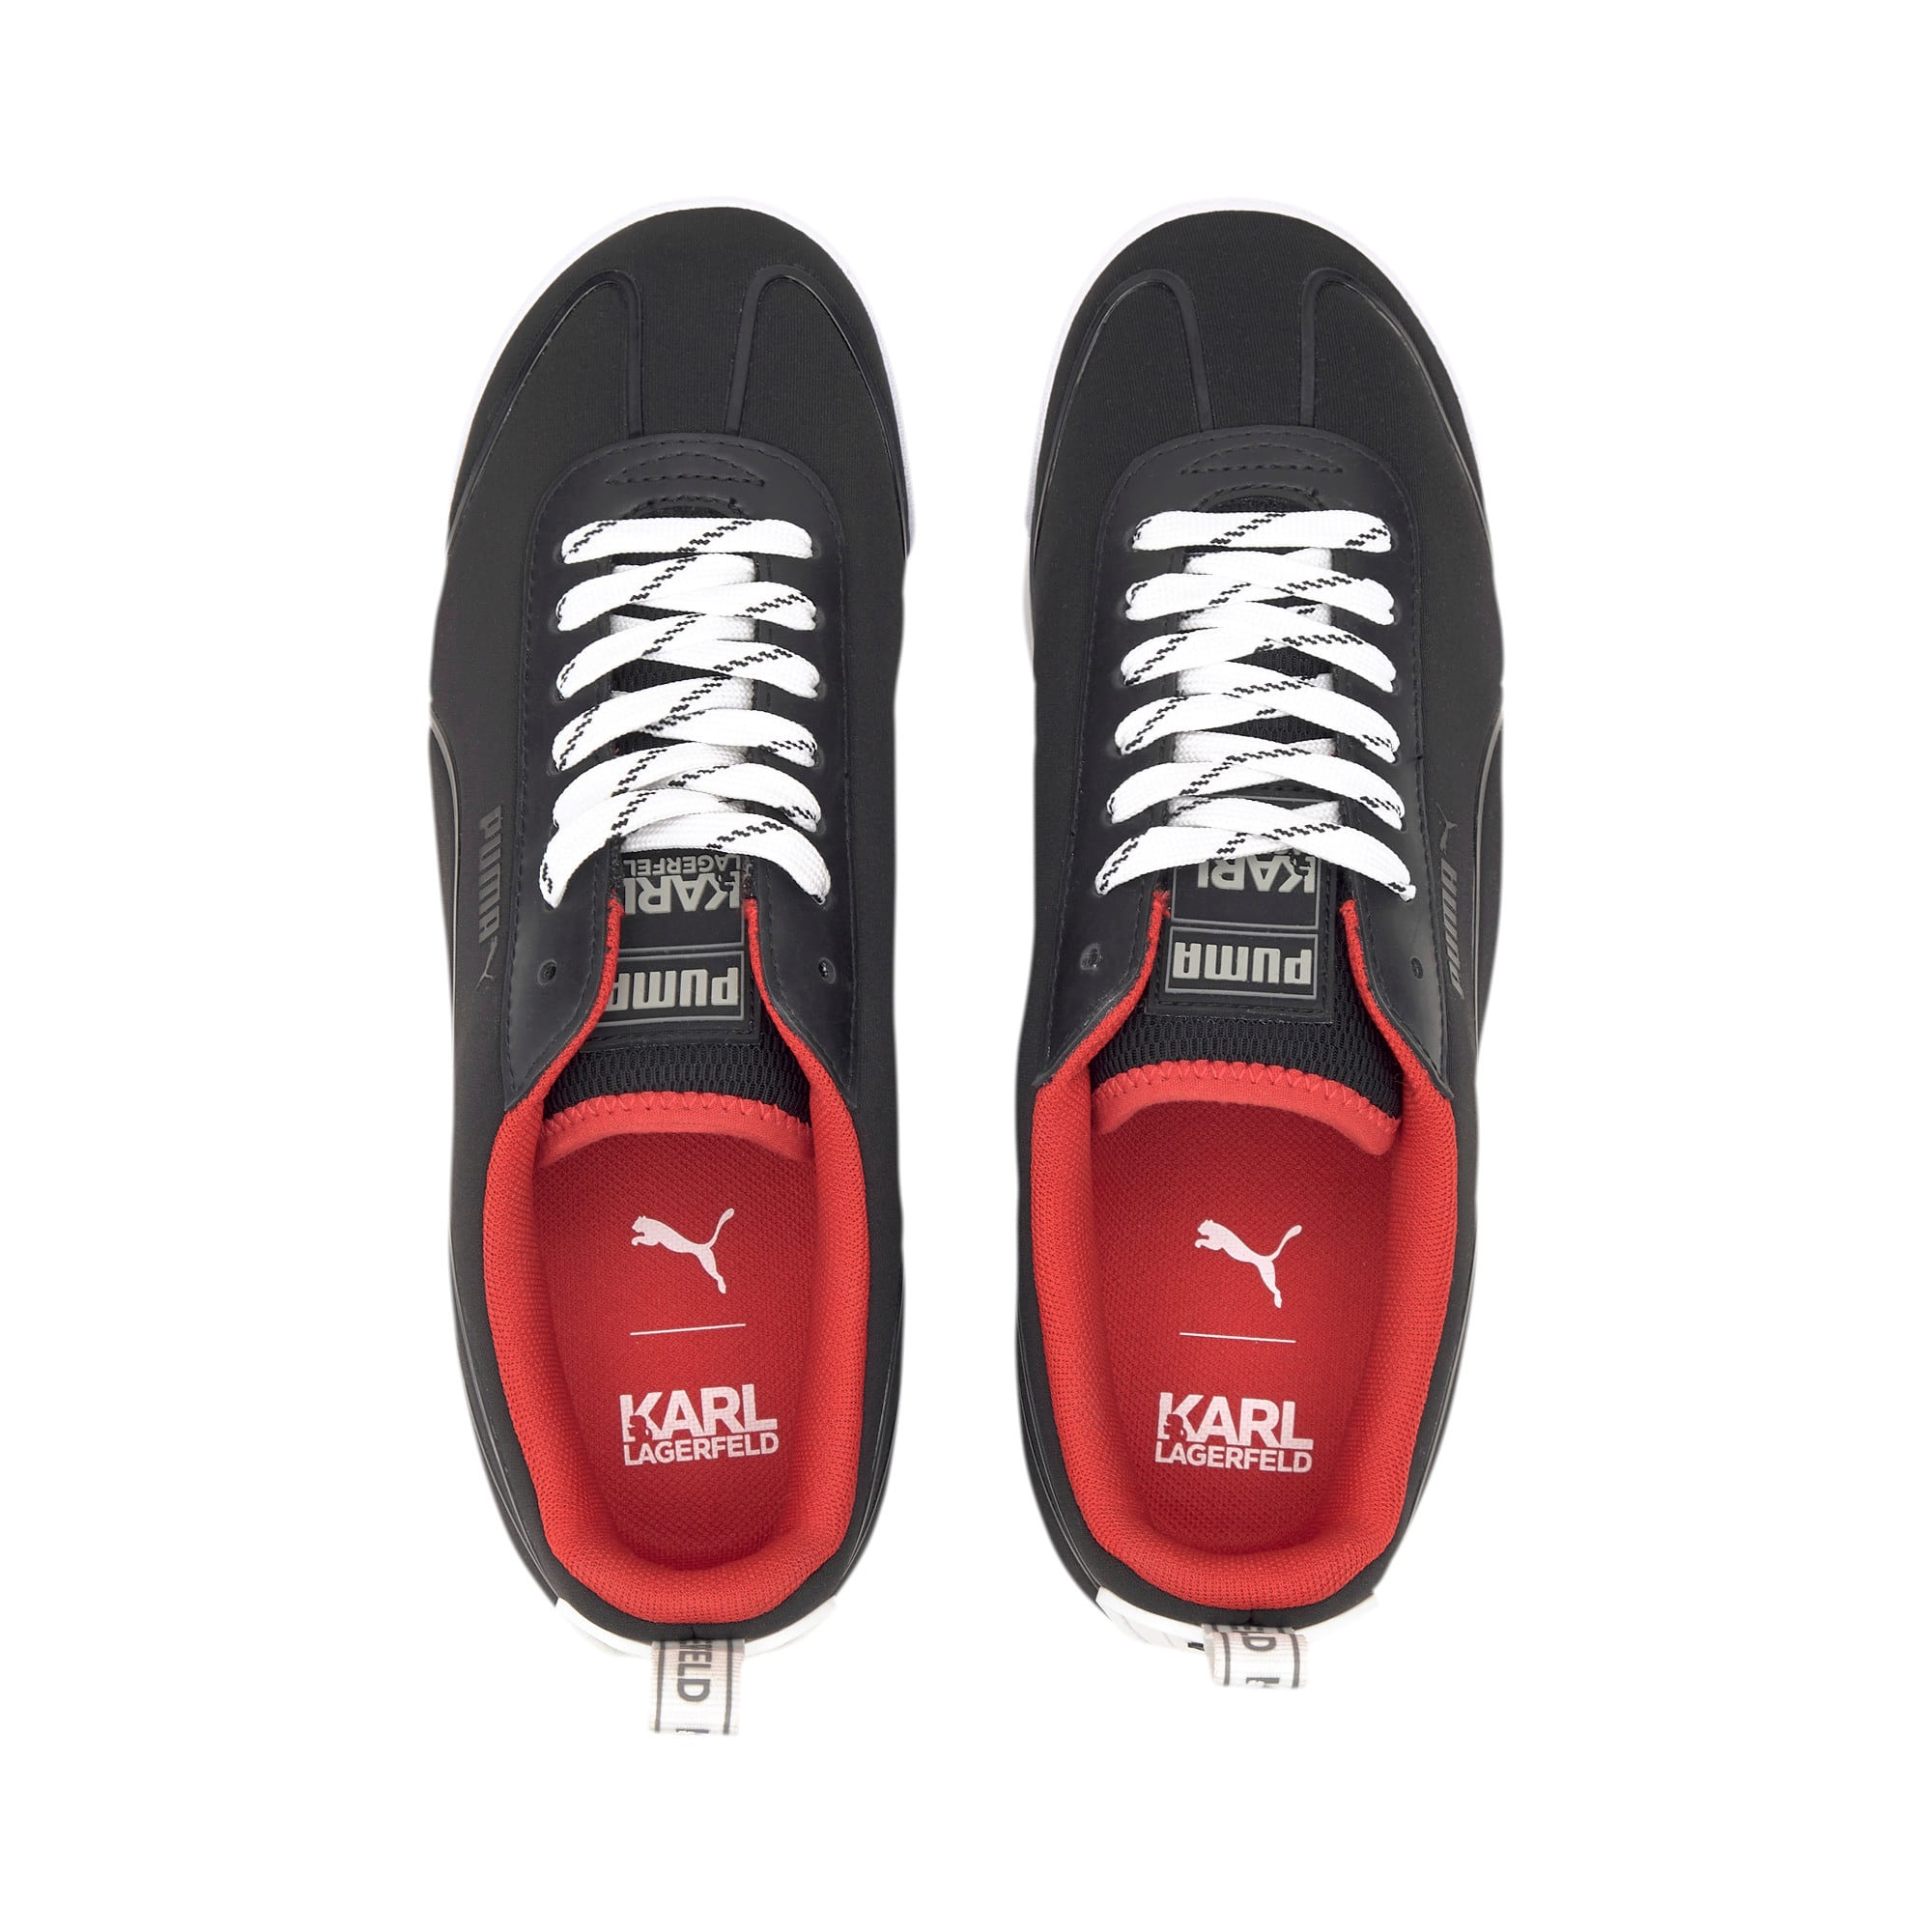 Thumbnail 7 of PUMA x KARL LAGERFELD Roma Amor Sneaker, Puma Black-Puma Black, medium